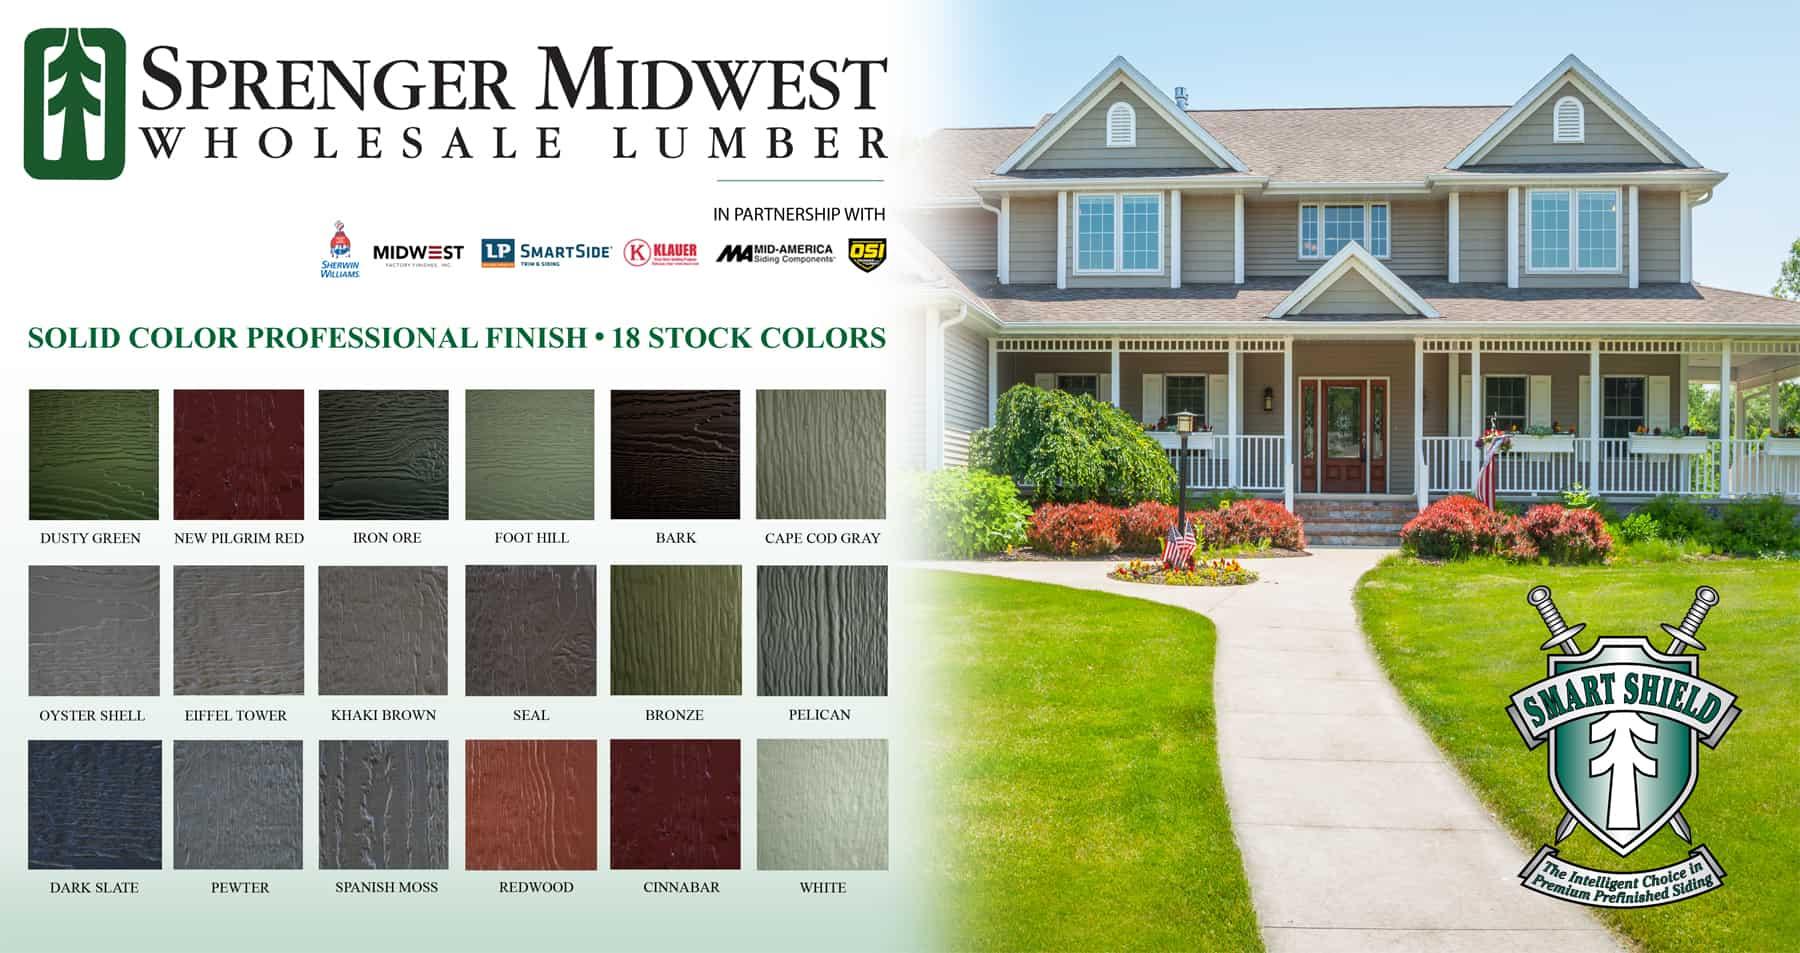 Sprenger midwest wholesale lumber prefinished siding for Lp smartside prefinished siding colors